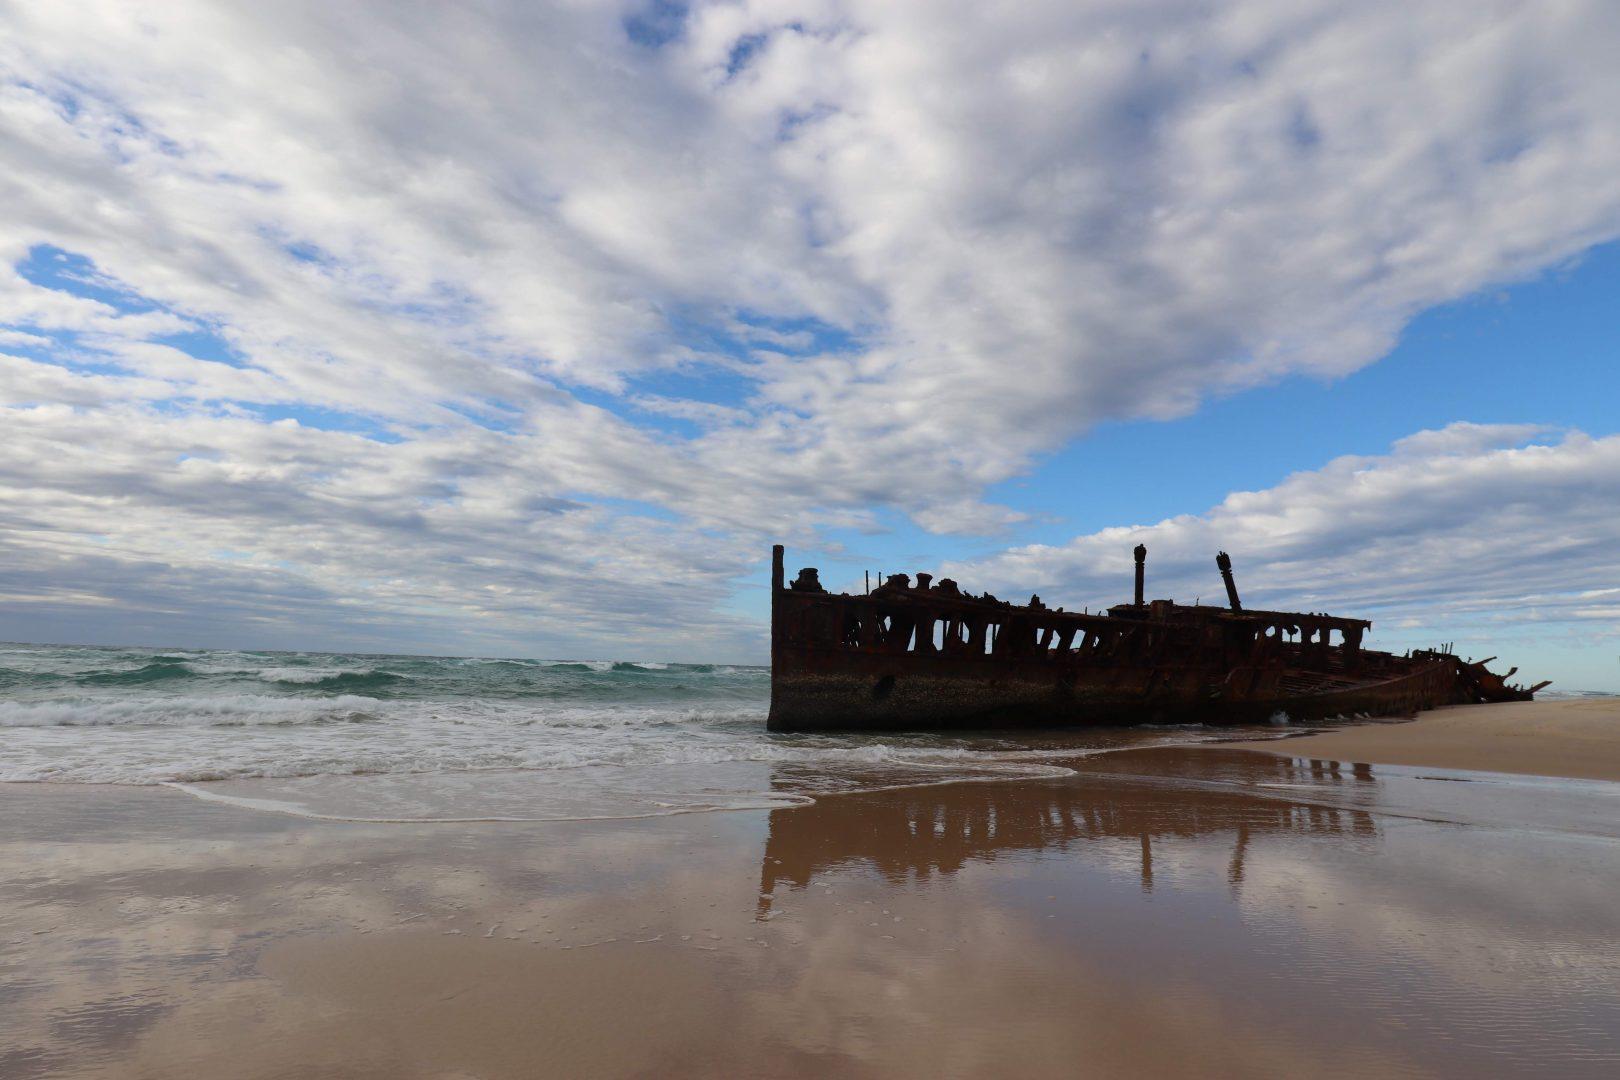 Maheno Shipwreck, Australia